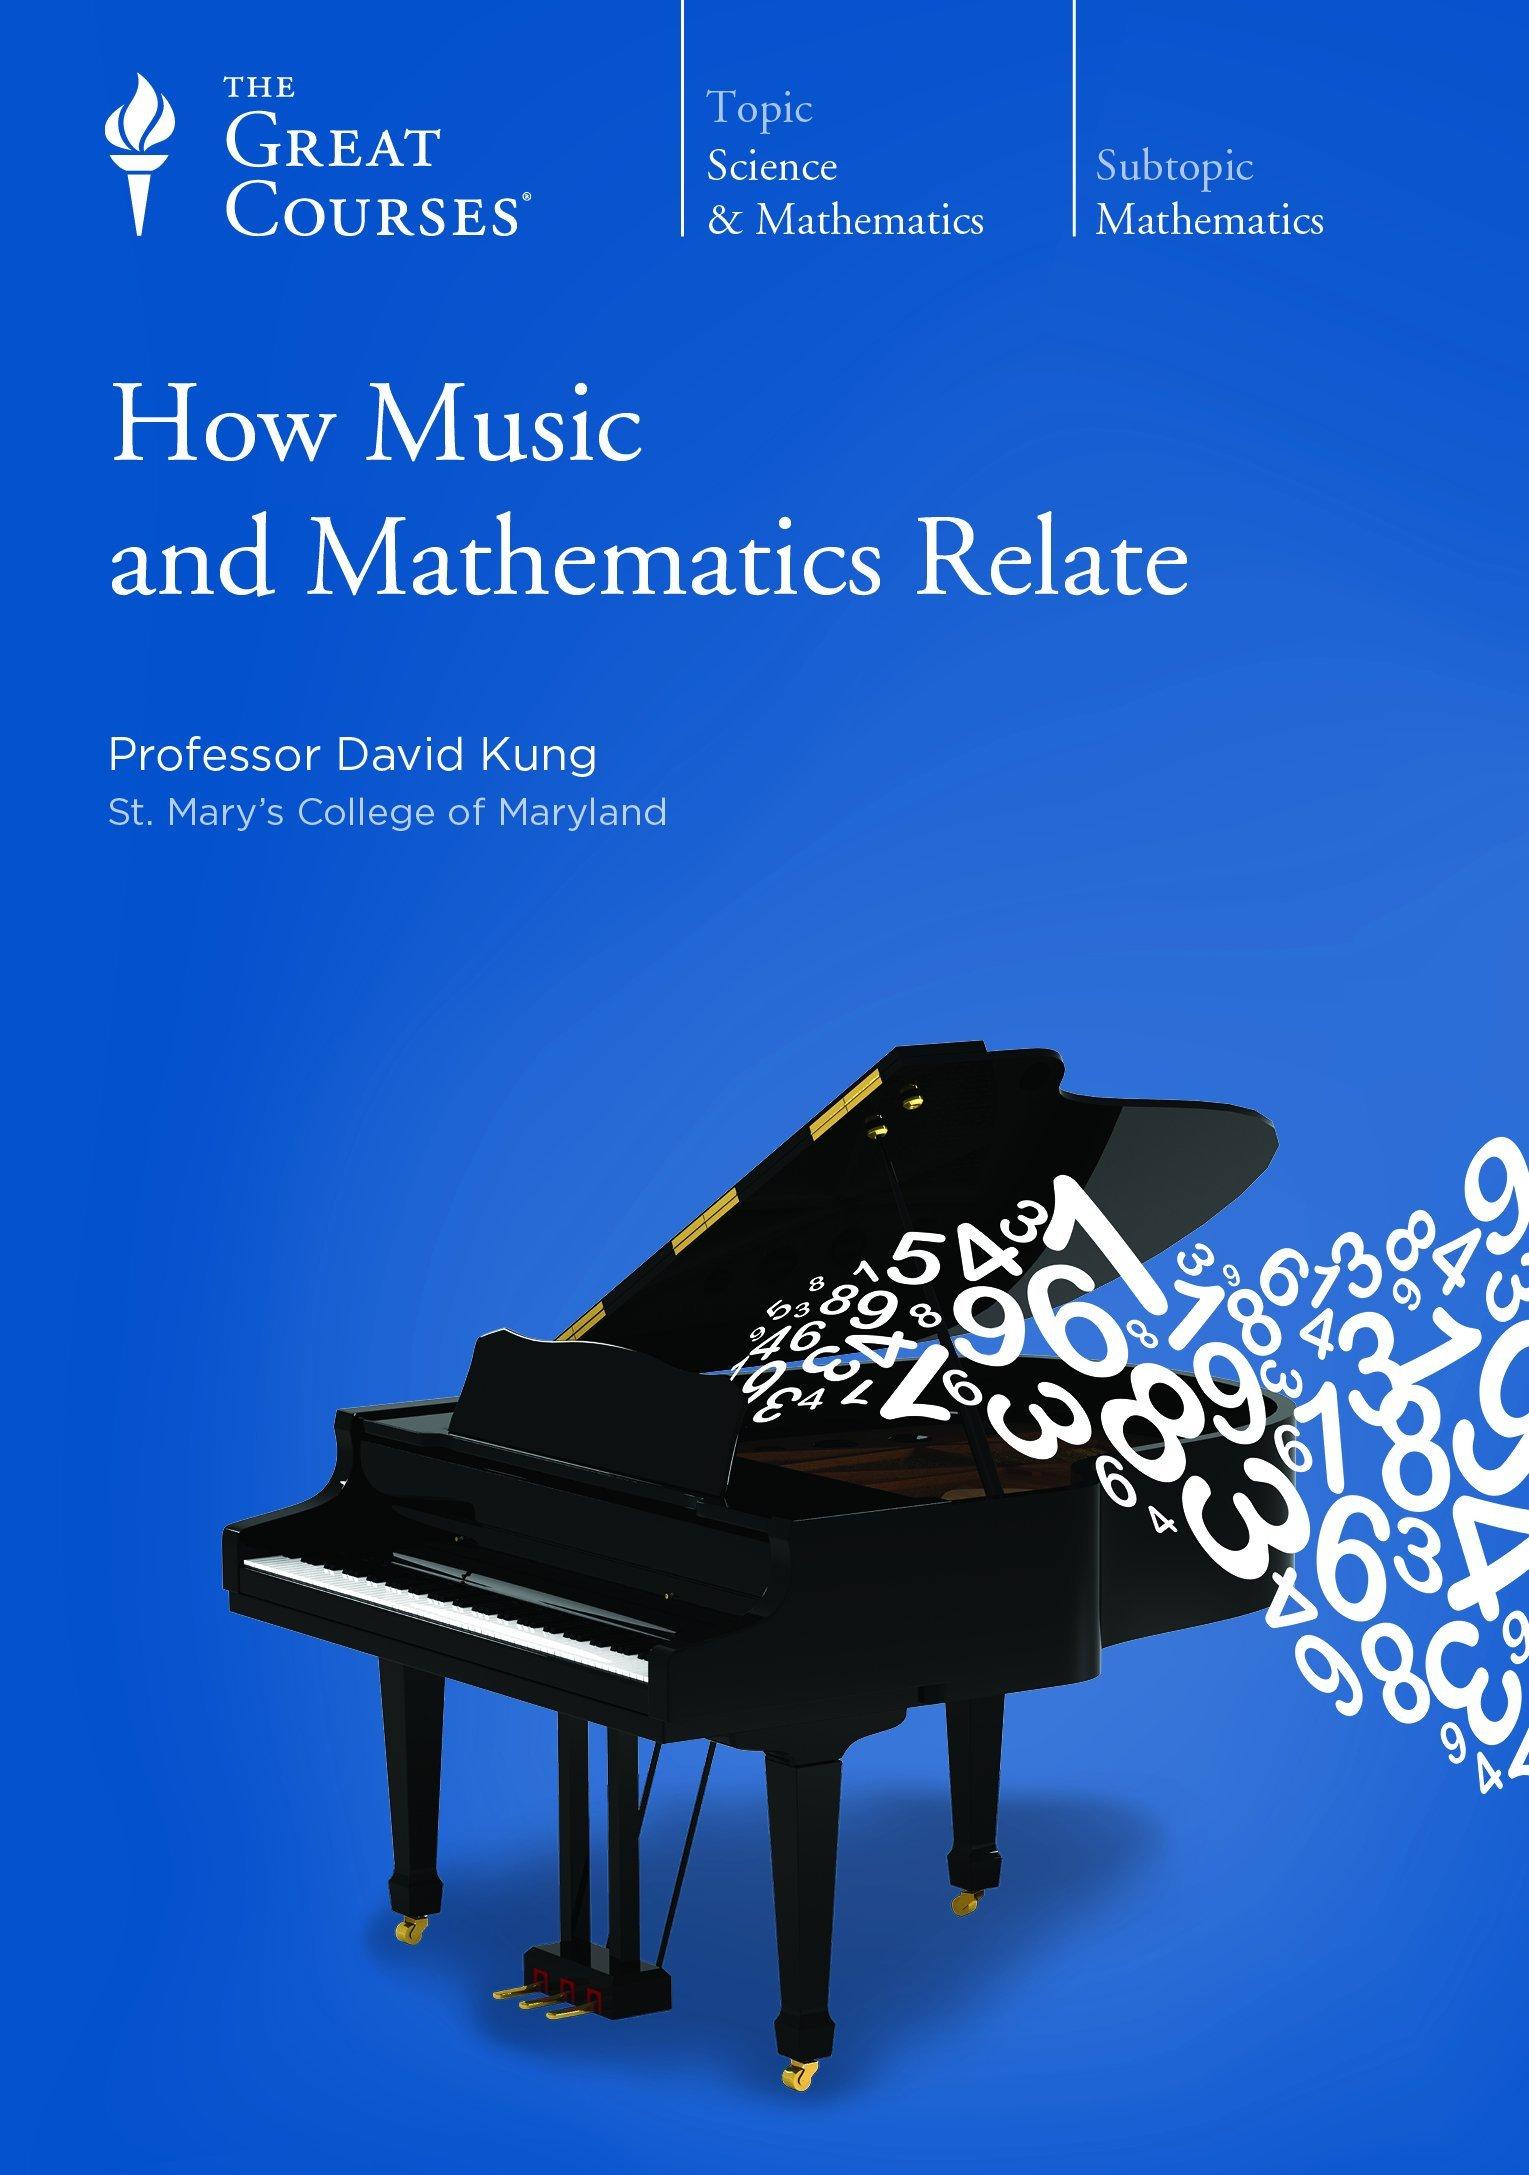 How Music and Mathematics Relate